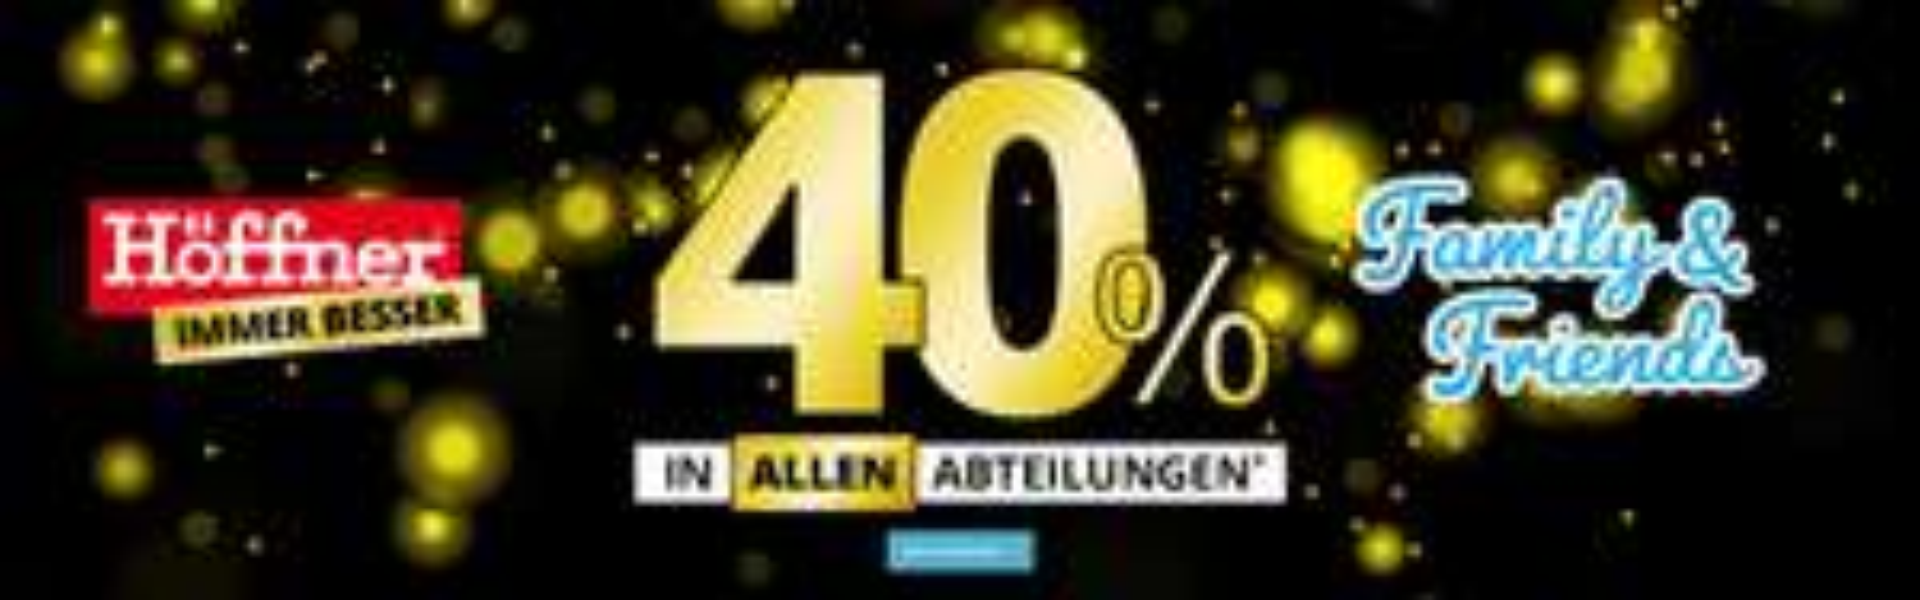 40% Rabatt bei Möbelhaus Höffner (online&offline)